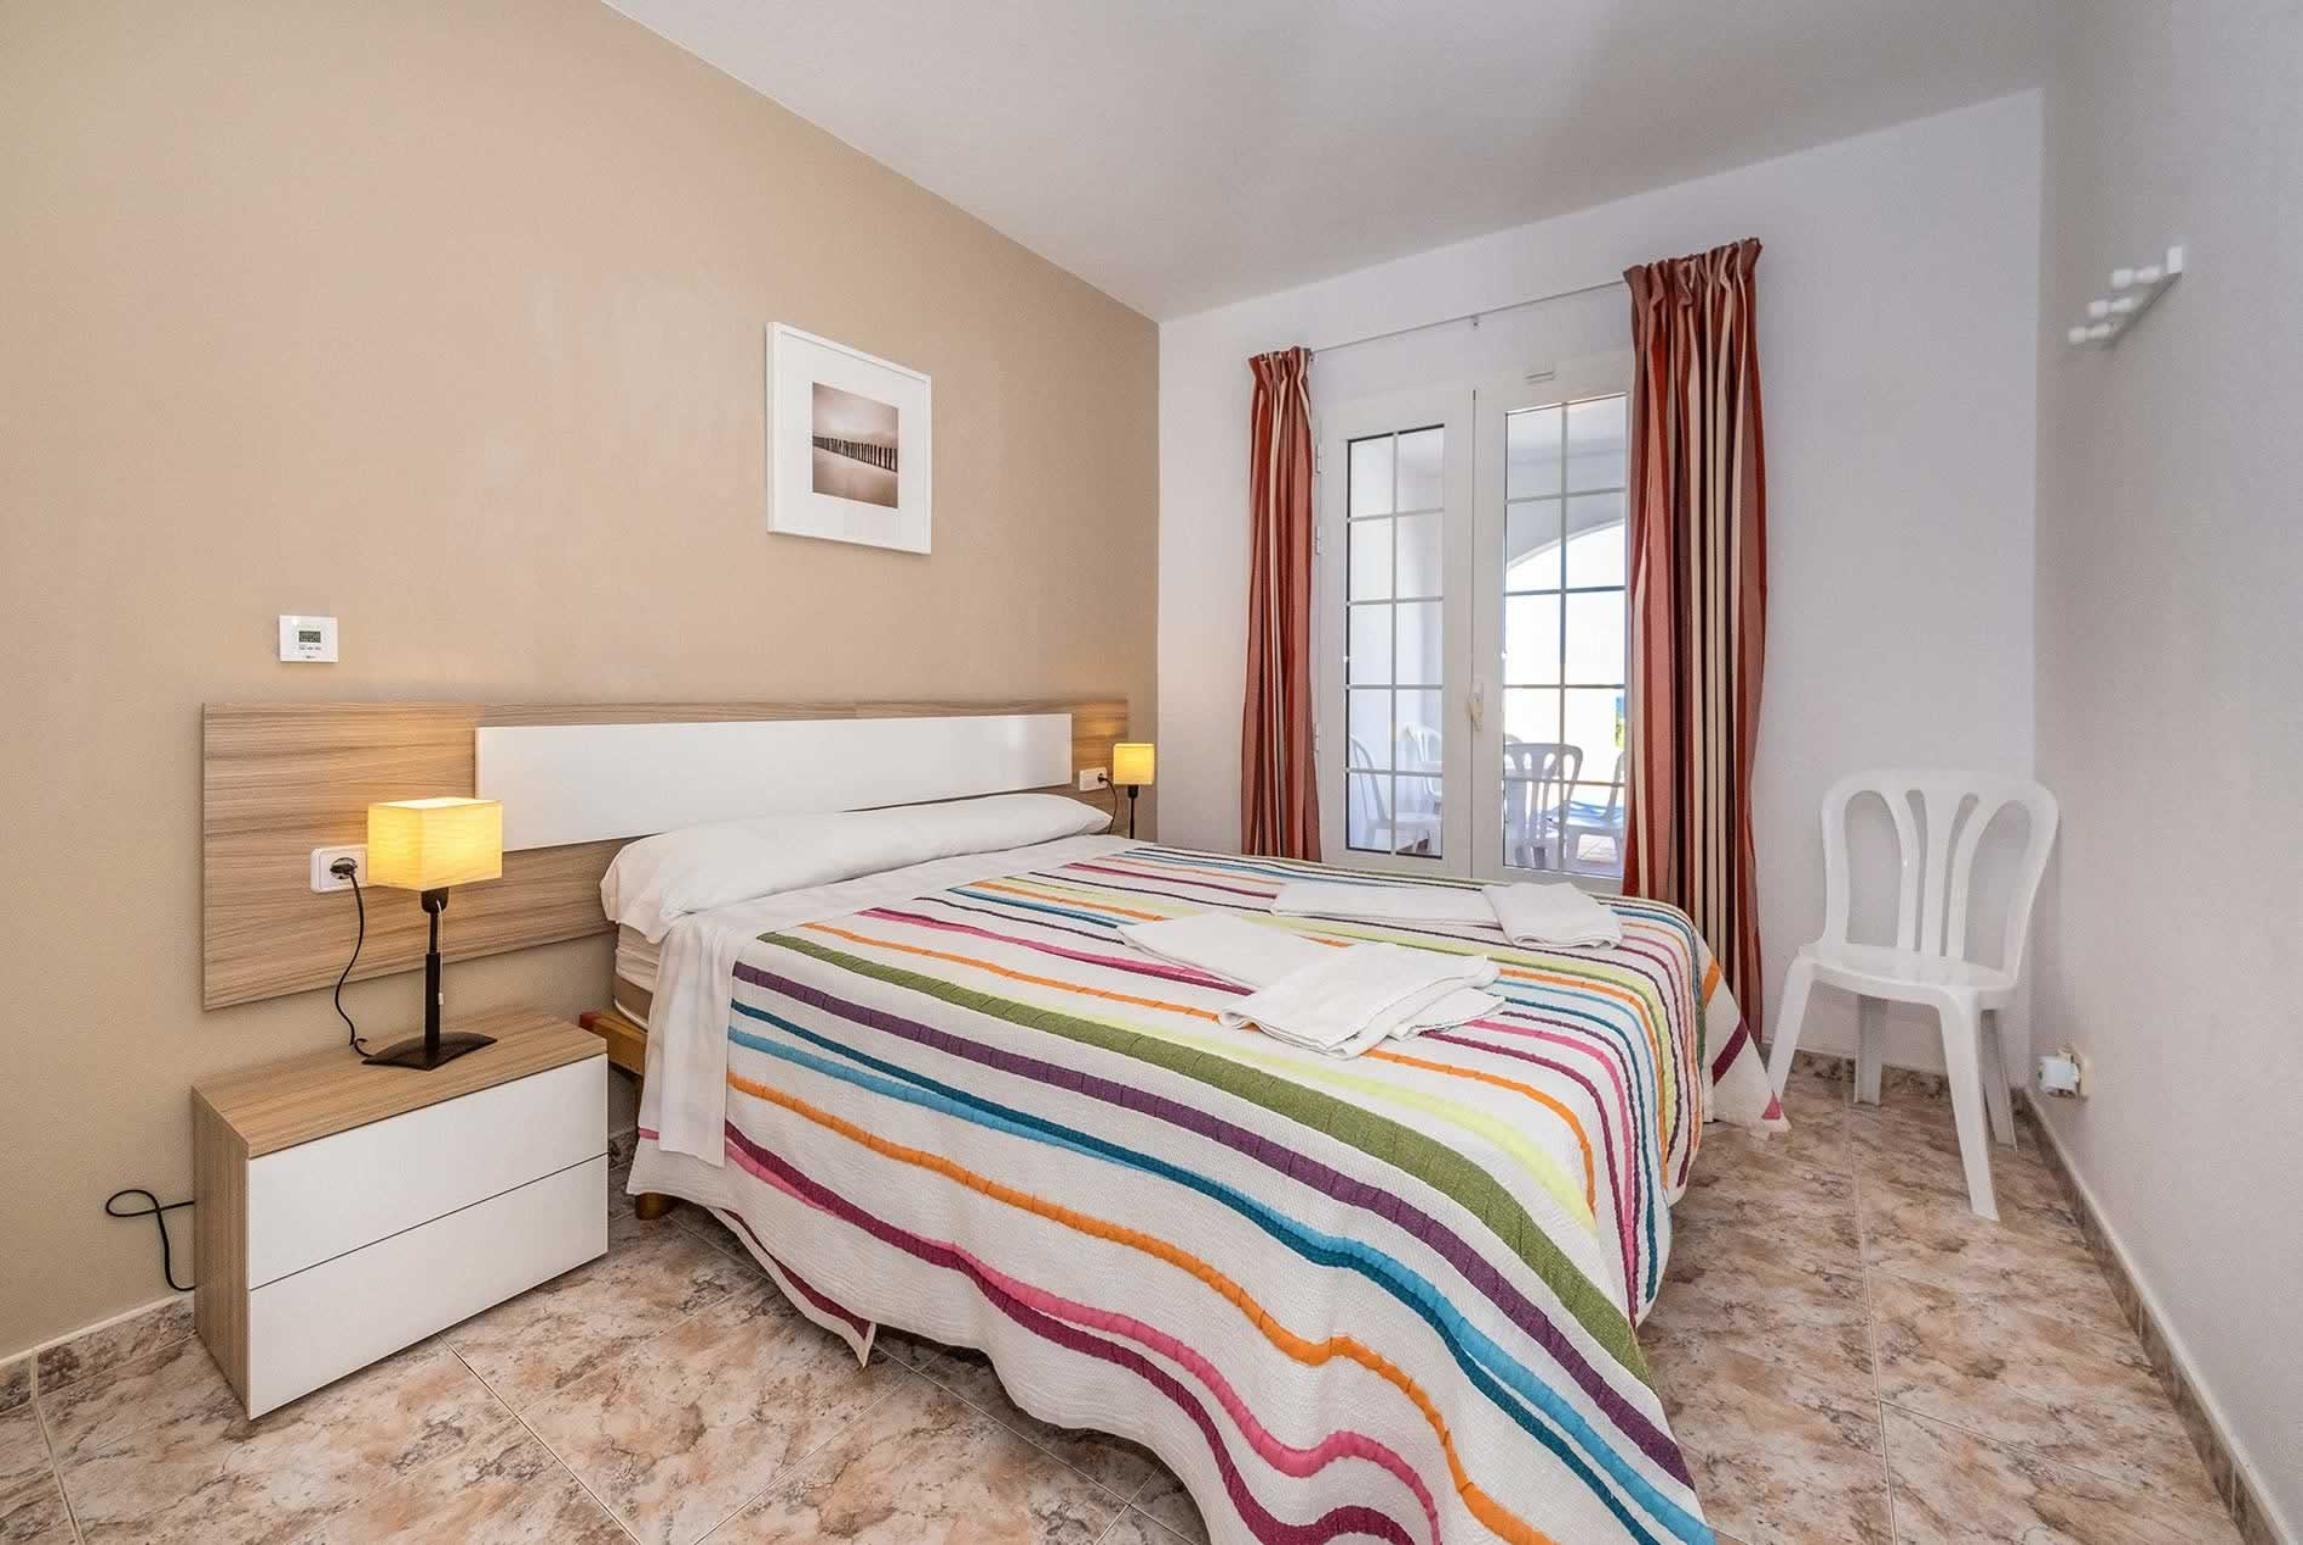 Ferienhaus Bellavista II (2654270), Arenal De'N Castell, Menorca, Balearische Inseln, Spanien, Bild 9